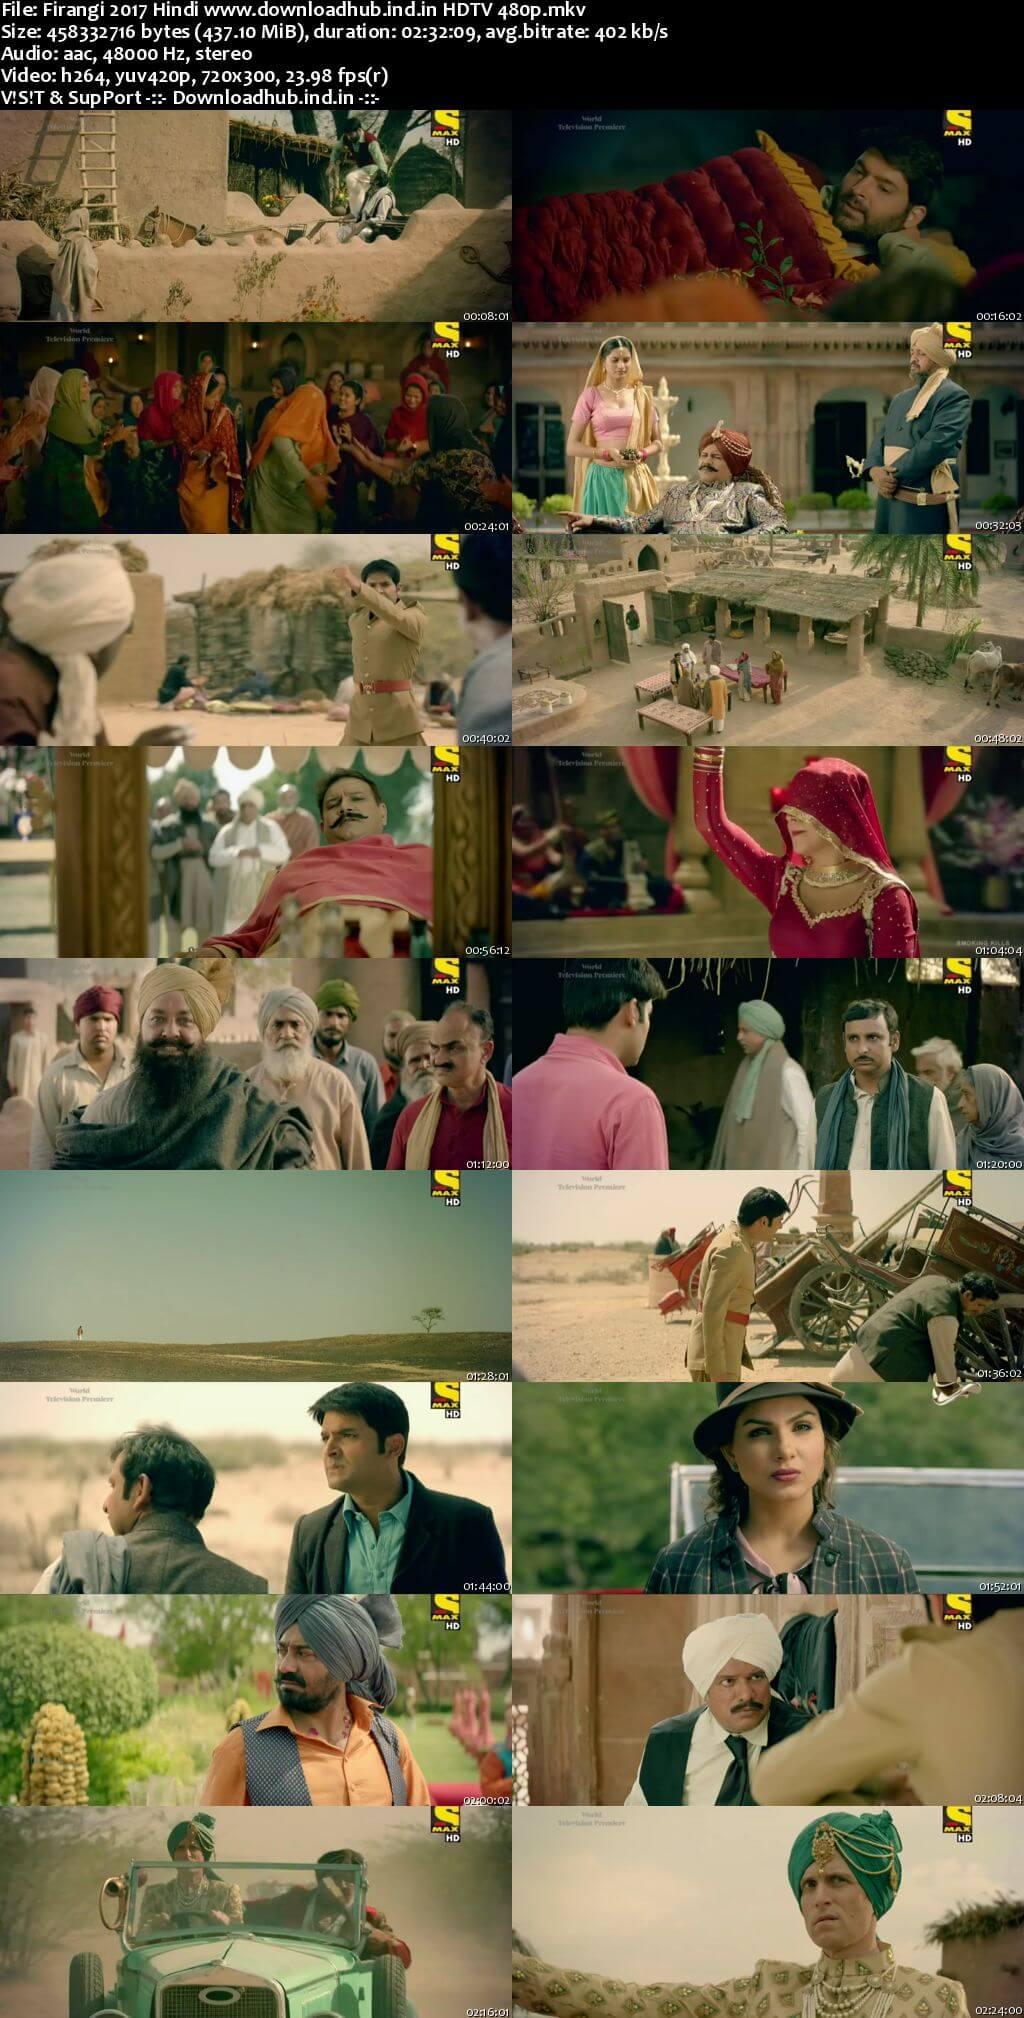 Firangi 2017 Hindi 400MB HDTV 480p